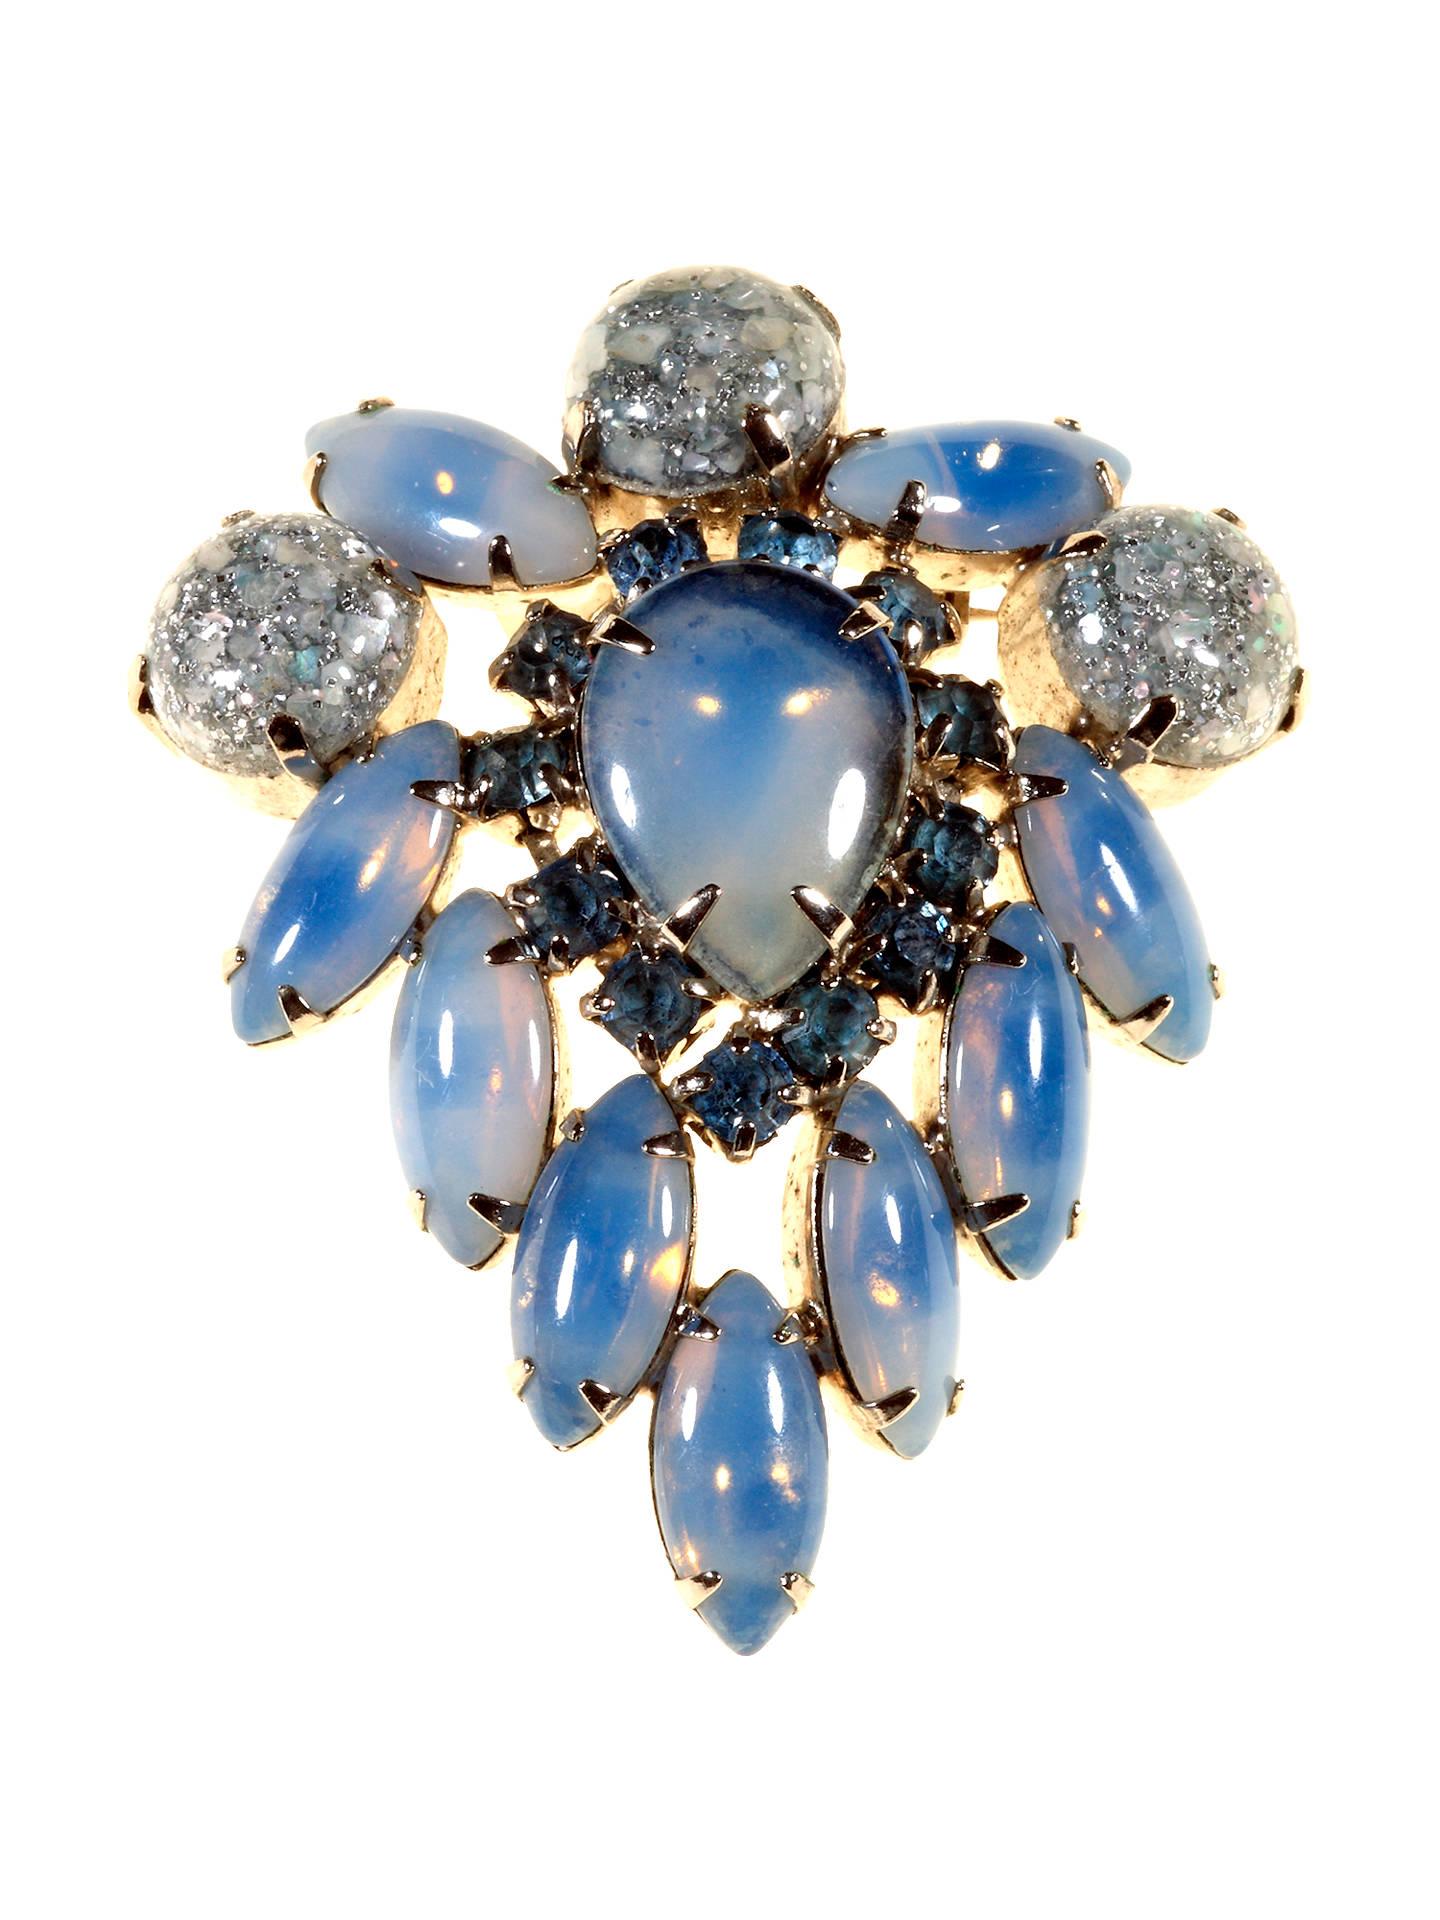 d19b1cd5fb6 Buy Alice Joseph Vintage 1950s Silver Confetti Stone Brooch, Blue Online at  johnlewis.com